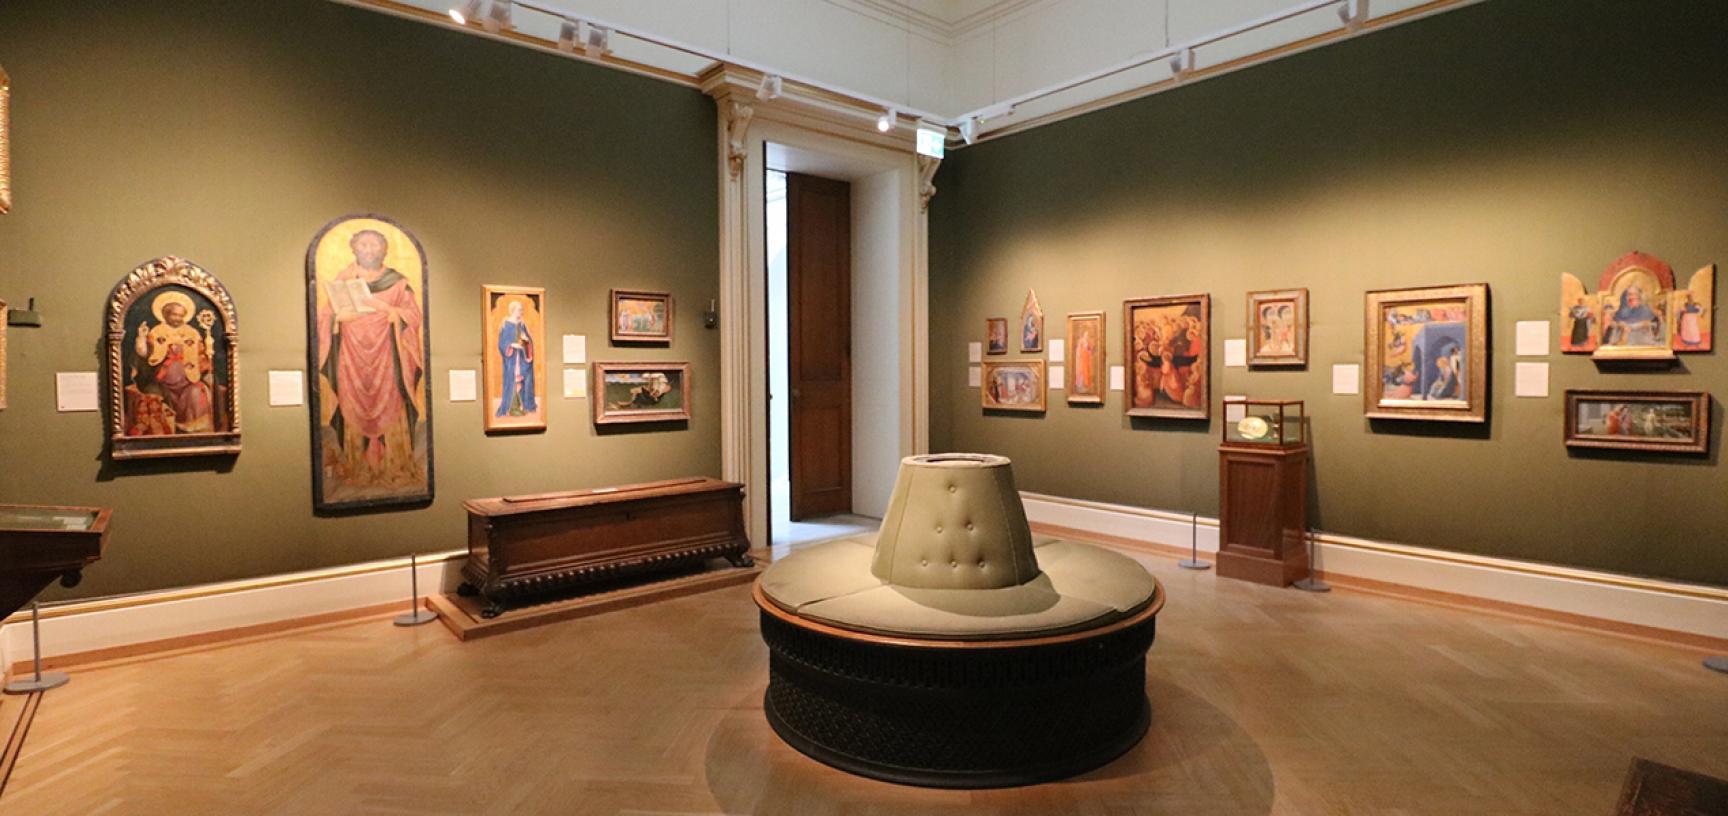 EARLY ITALIAN ART Gallery at the Ashmolean Museum